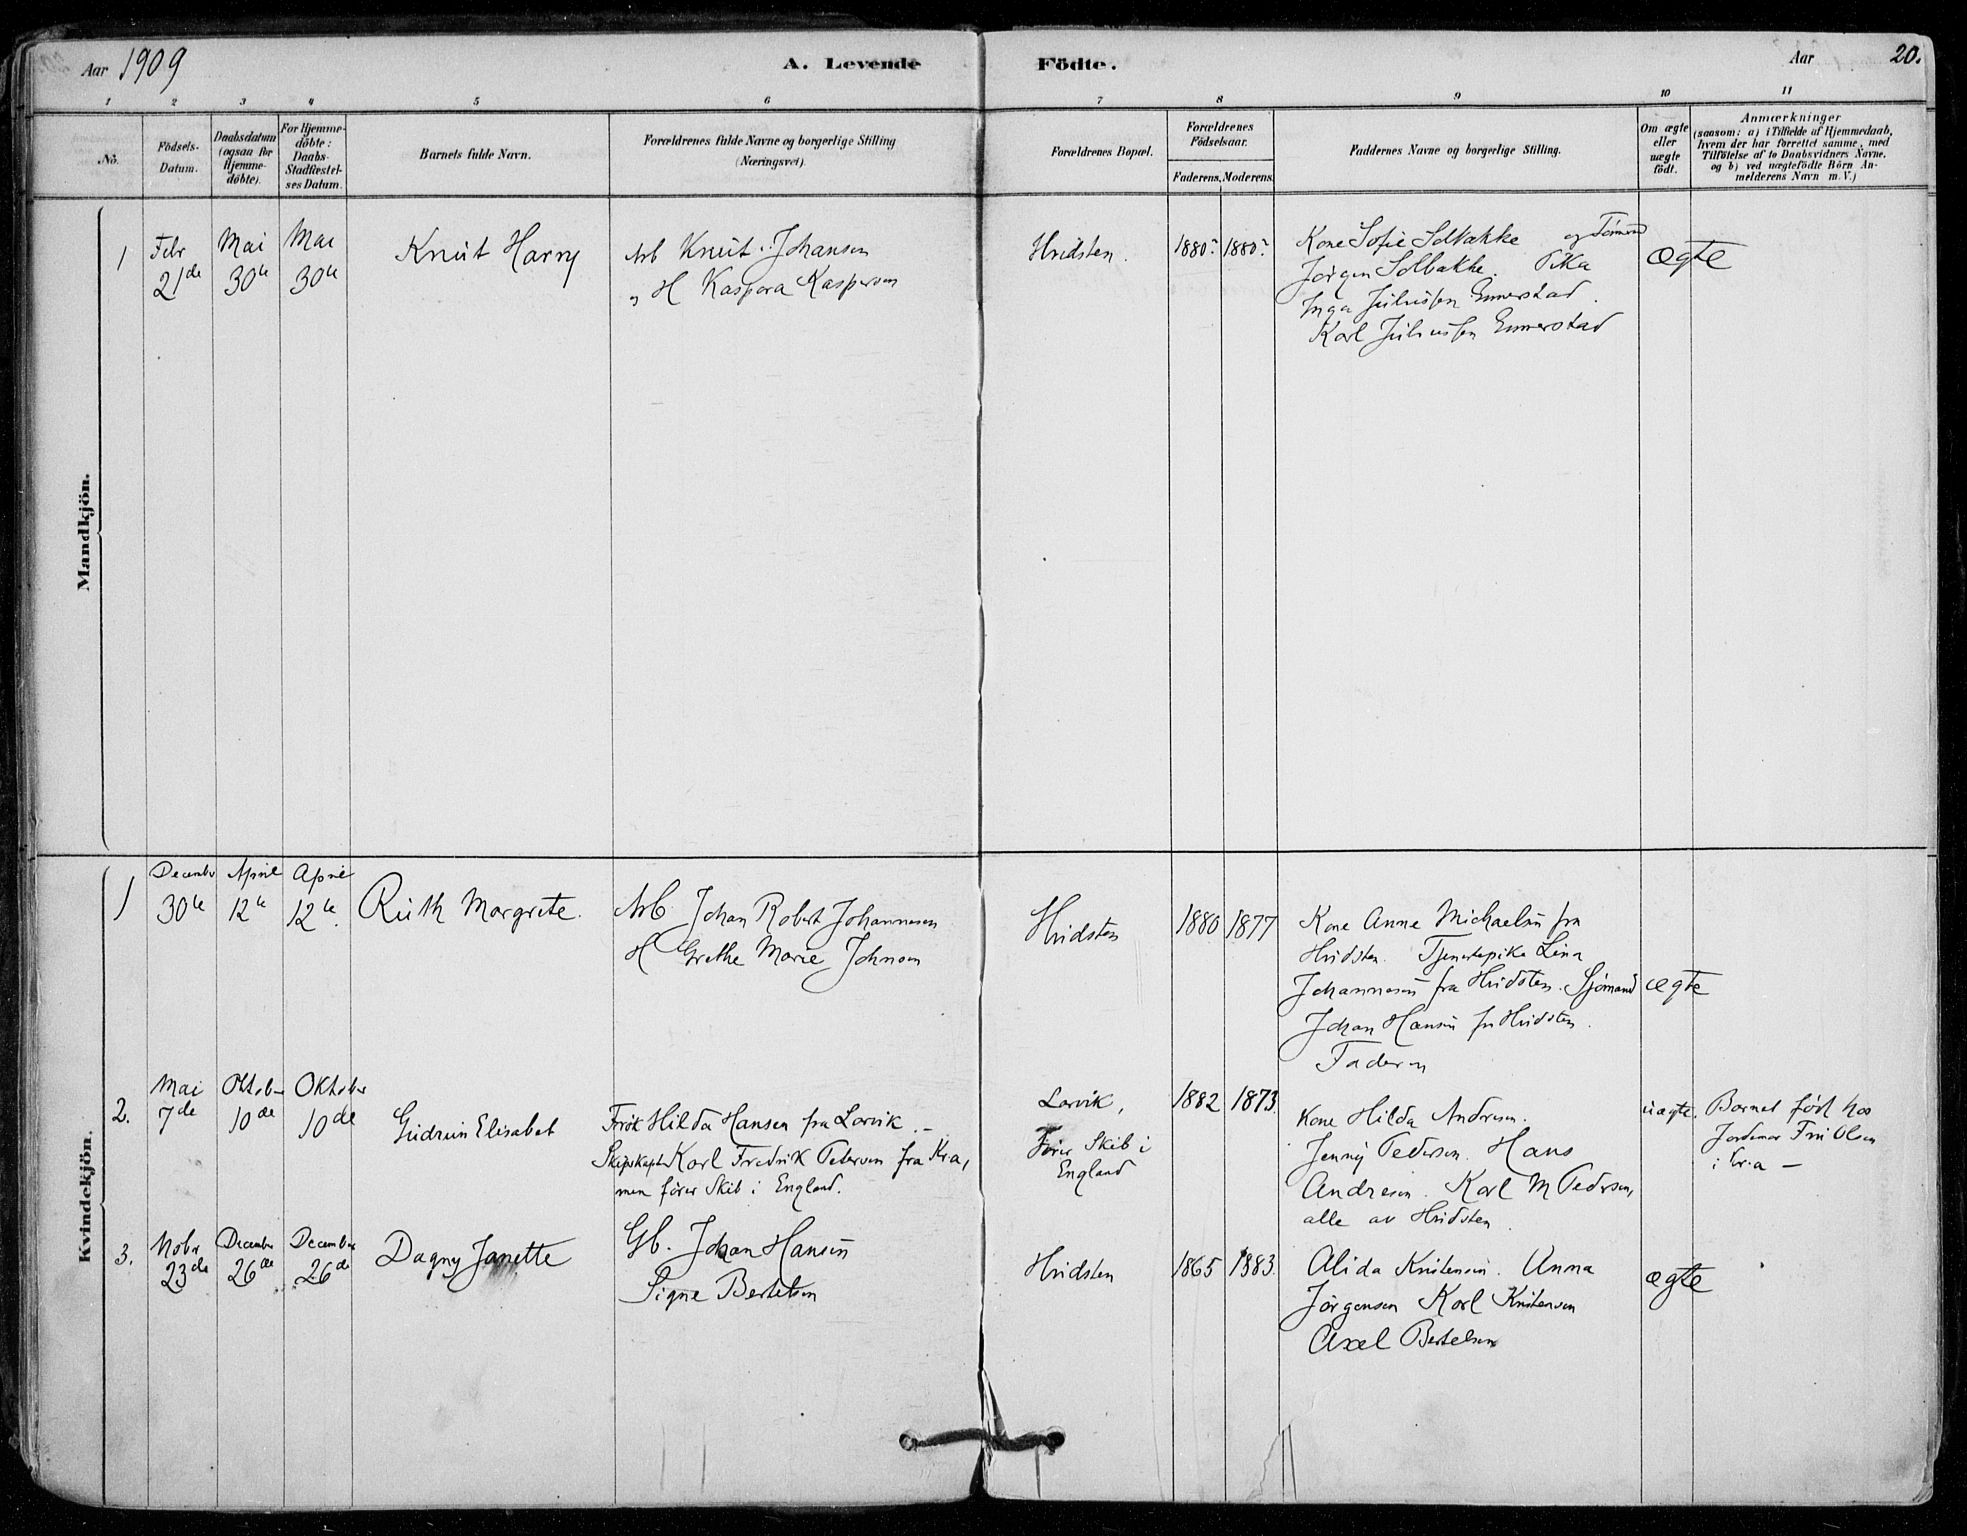 SAO, Vestby prestekontor Kirkebøker, F/Fd/L0001: Ministerialbok nr. IV 1, 1878-1945, s. 20